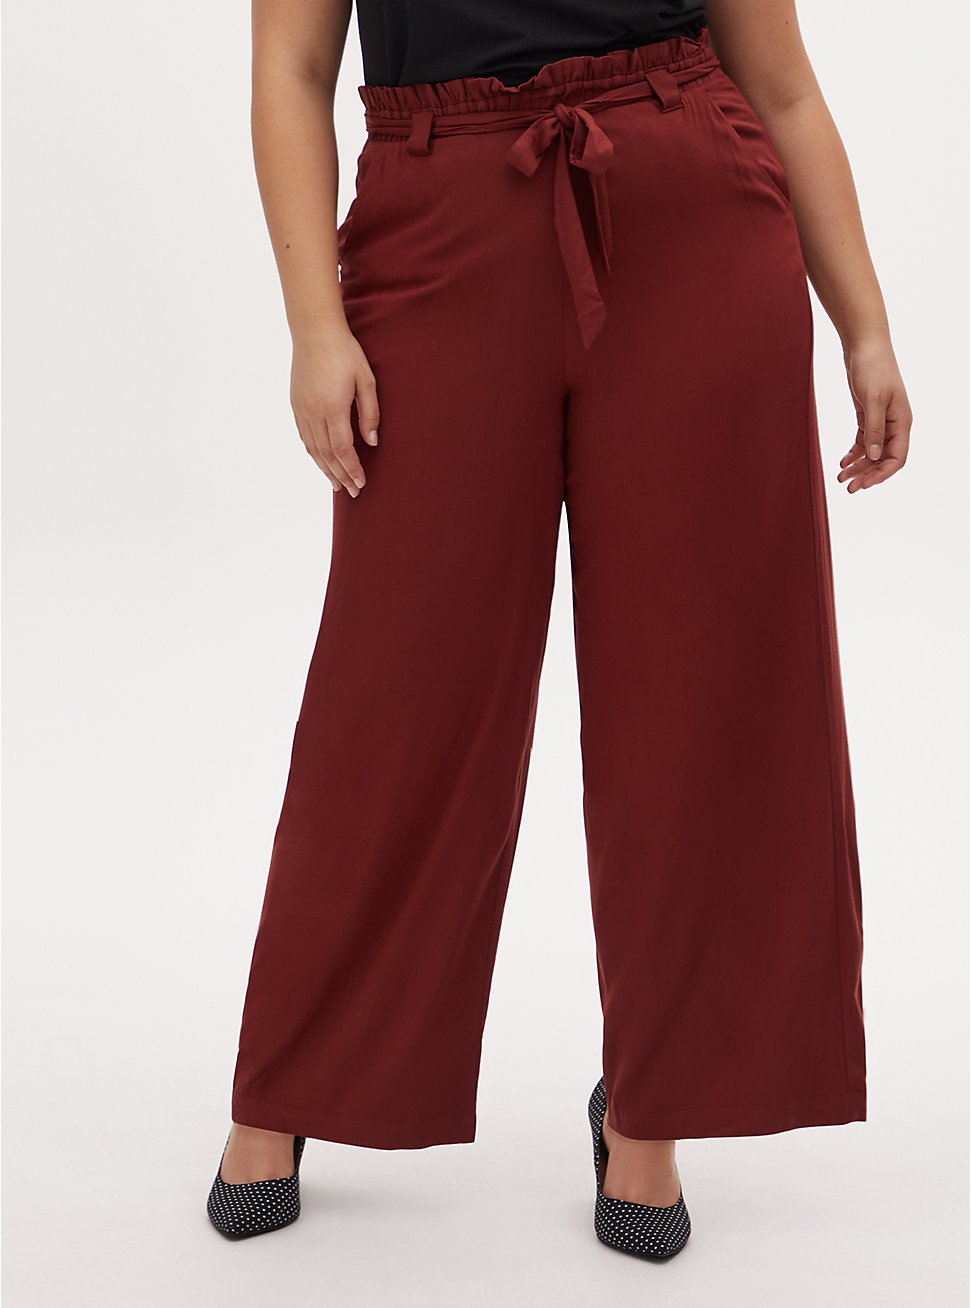 Rust Red Twill Self Tie Paperbag Waist Wide Leg Pant, BROWN, hi-res